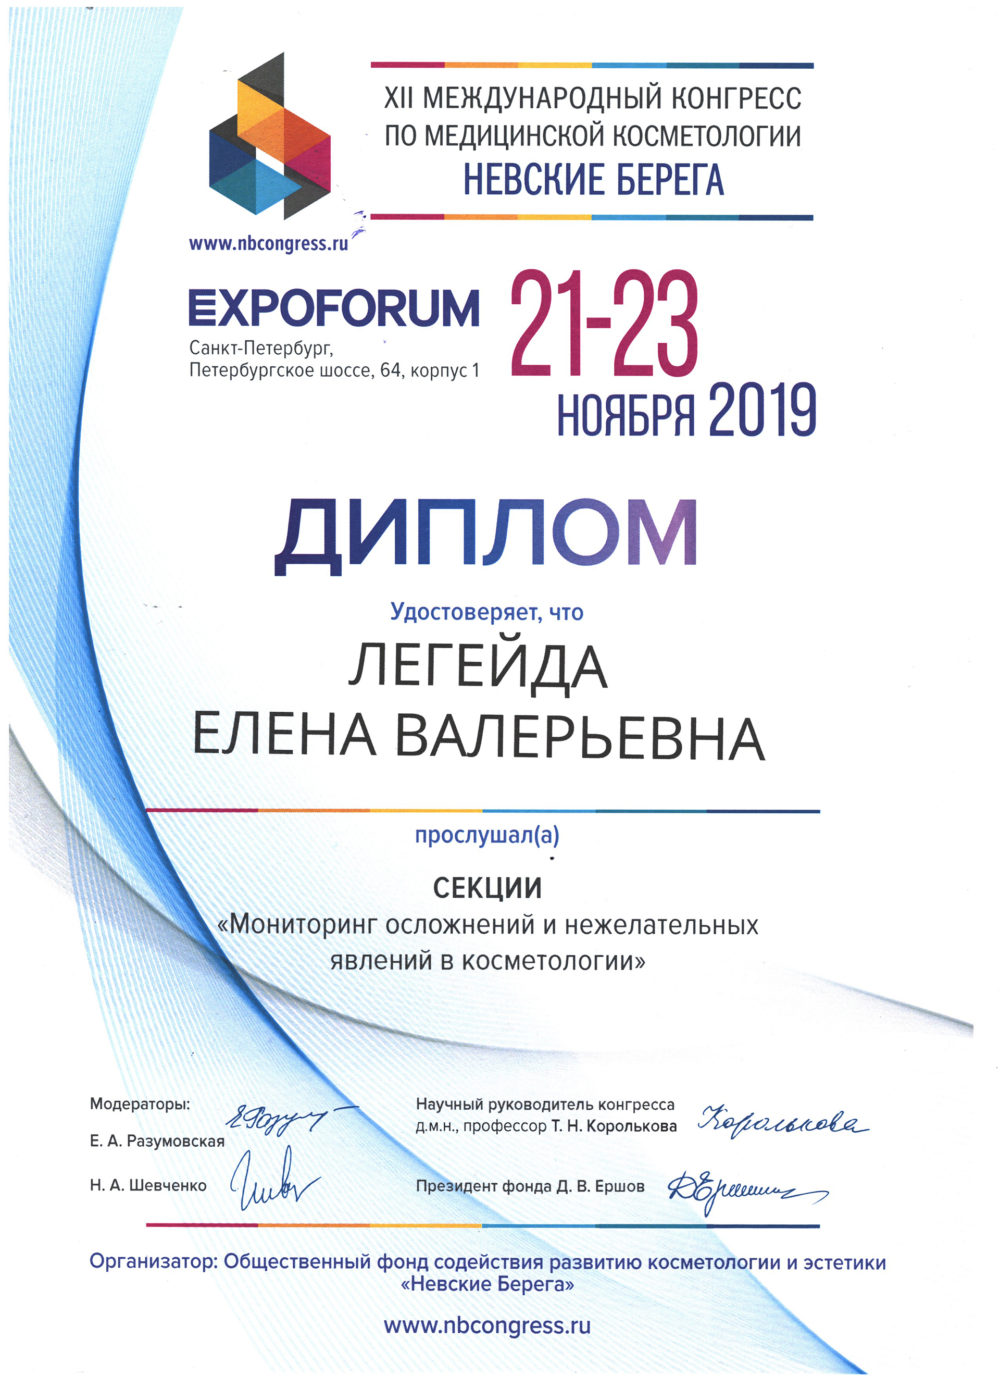 Сертификат - Expoforum. Легейда Елена Валерьевна